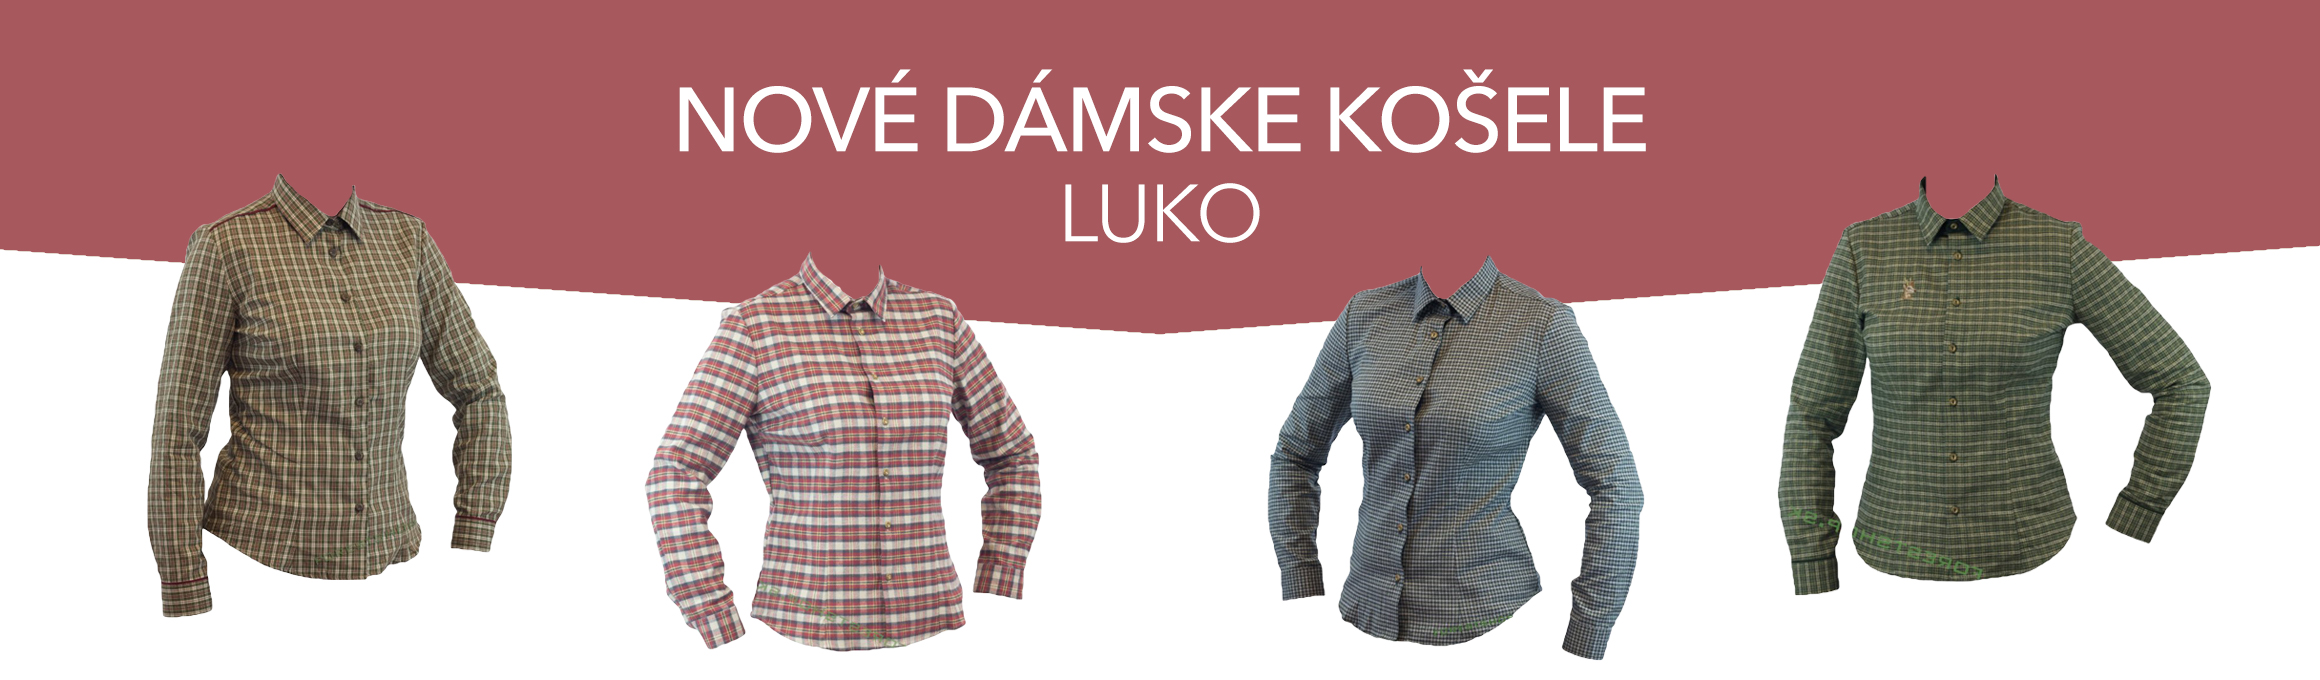 03 Nové dámske košele Luko už v predaji. www.forestshop.sk